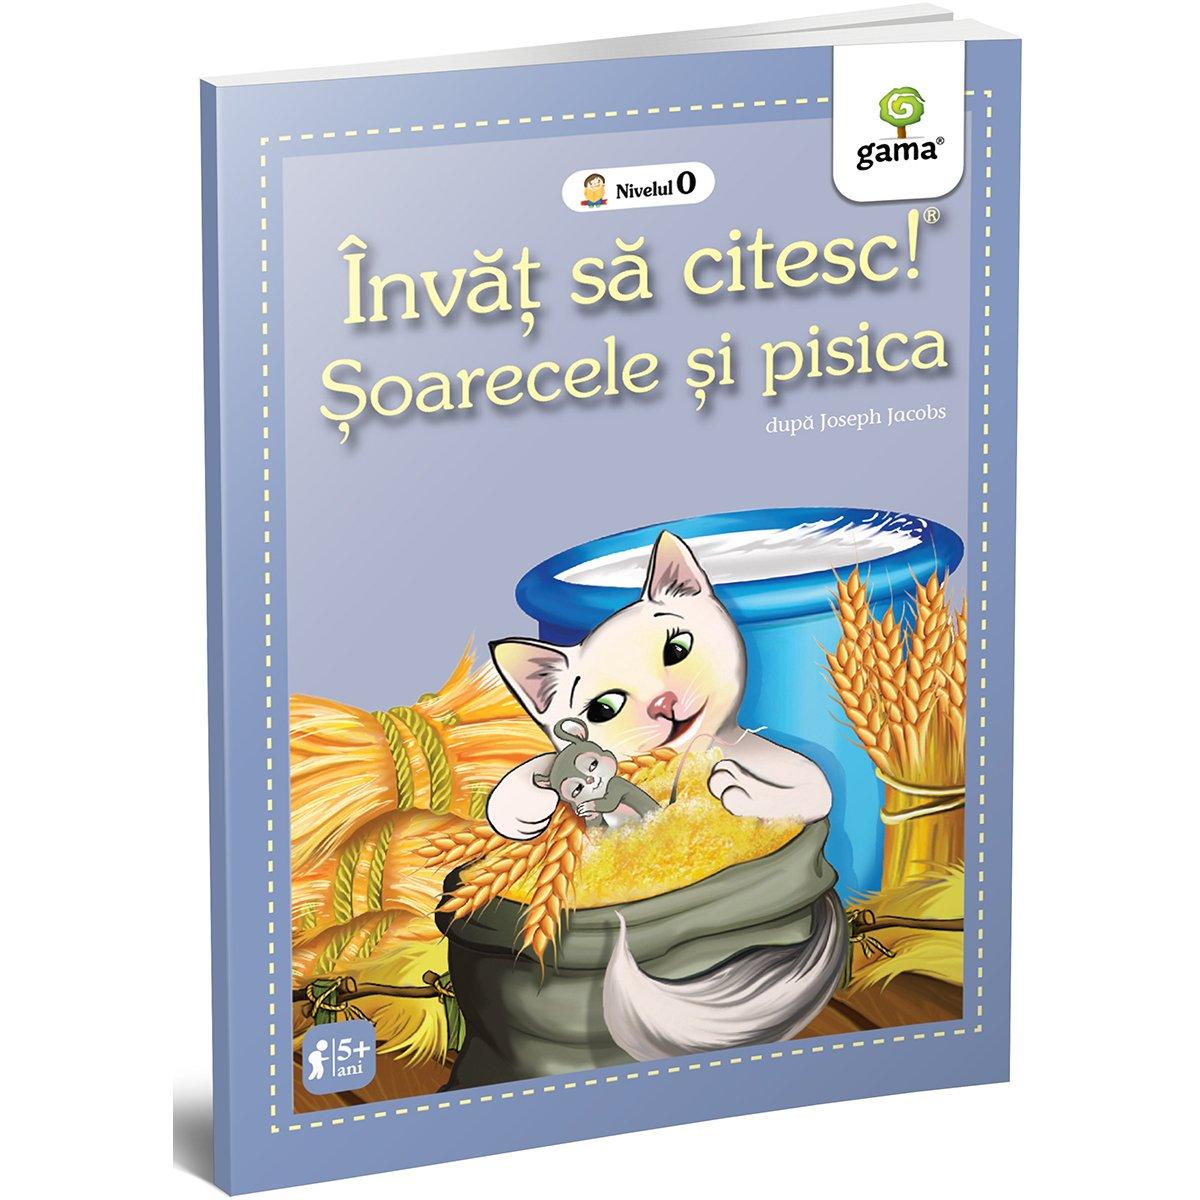 Carte Editura Gama, Soarecele si pisica, Invat sa citesc! Nivelul 0